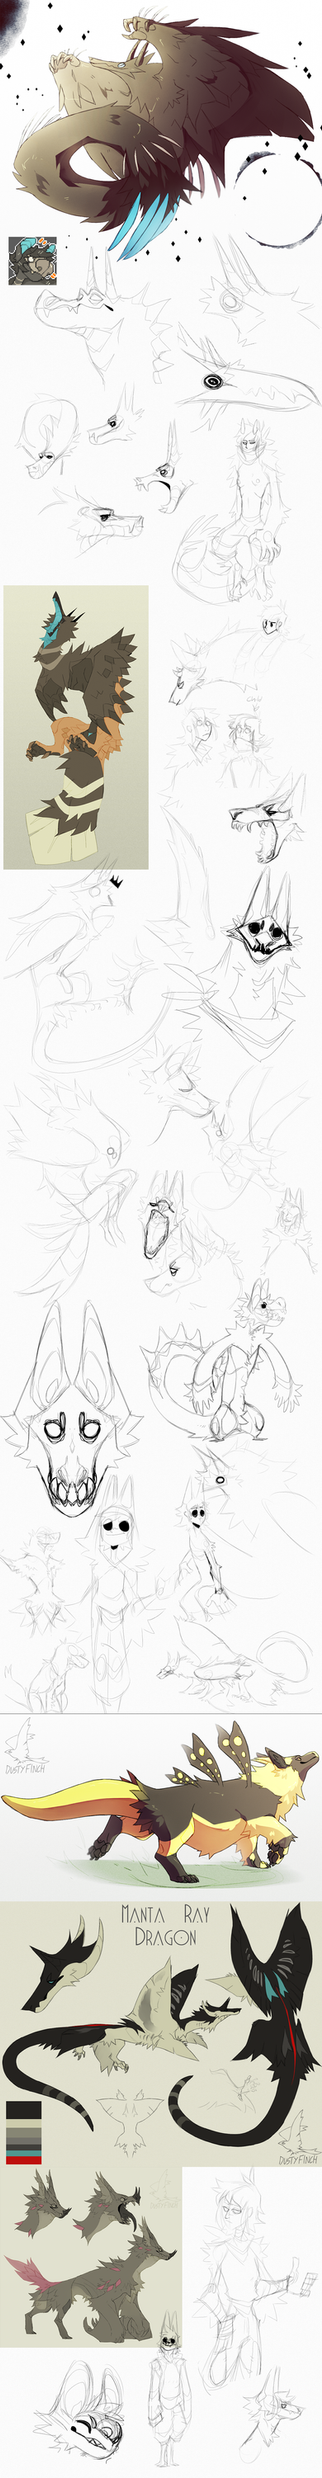 sketch dump no.6 by Dusty-Demon